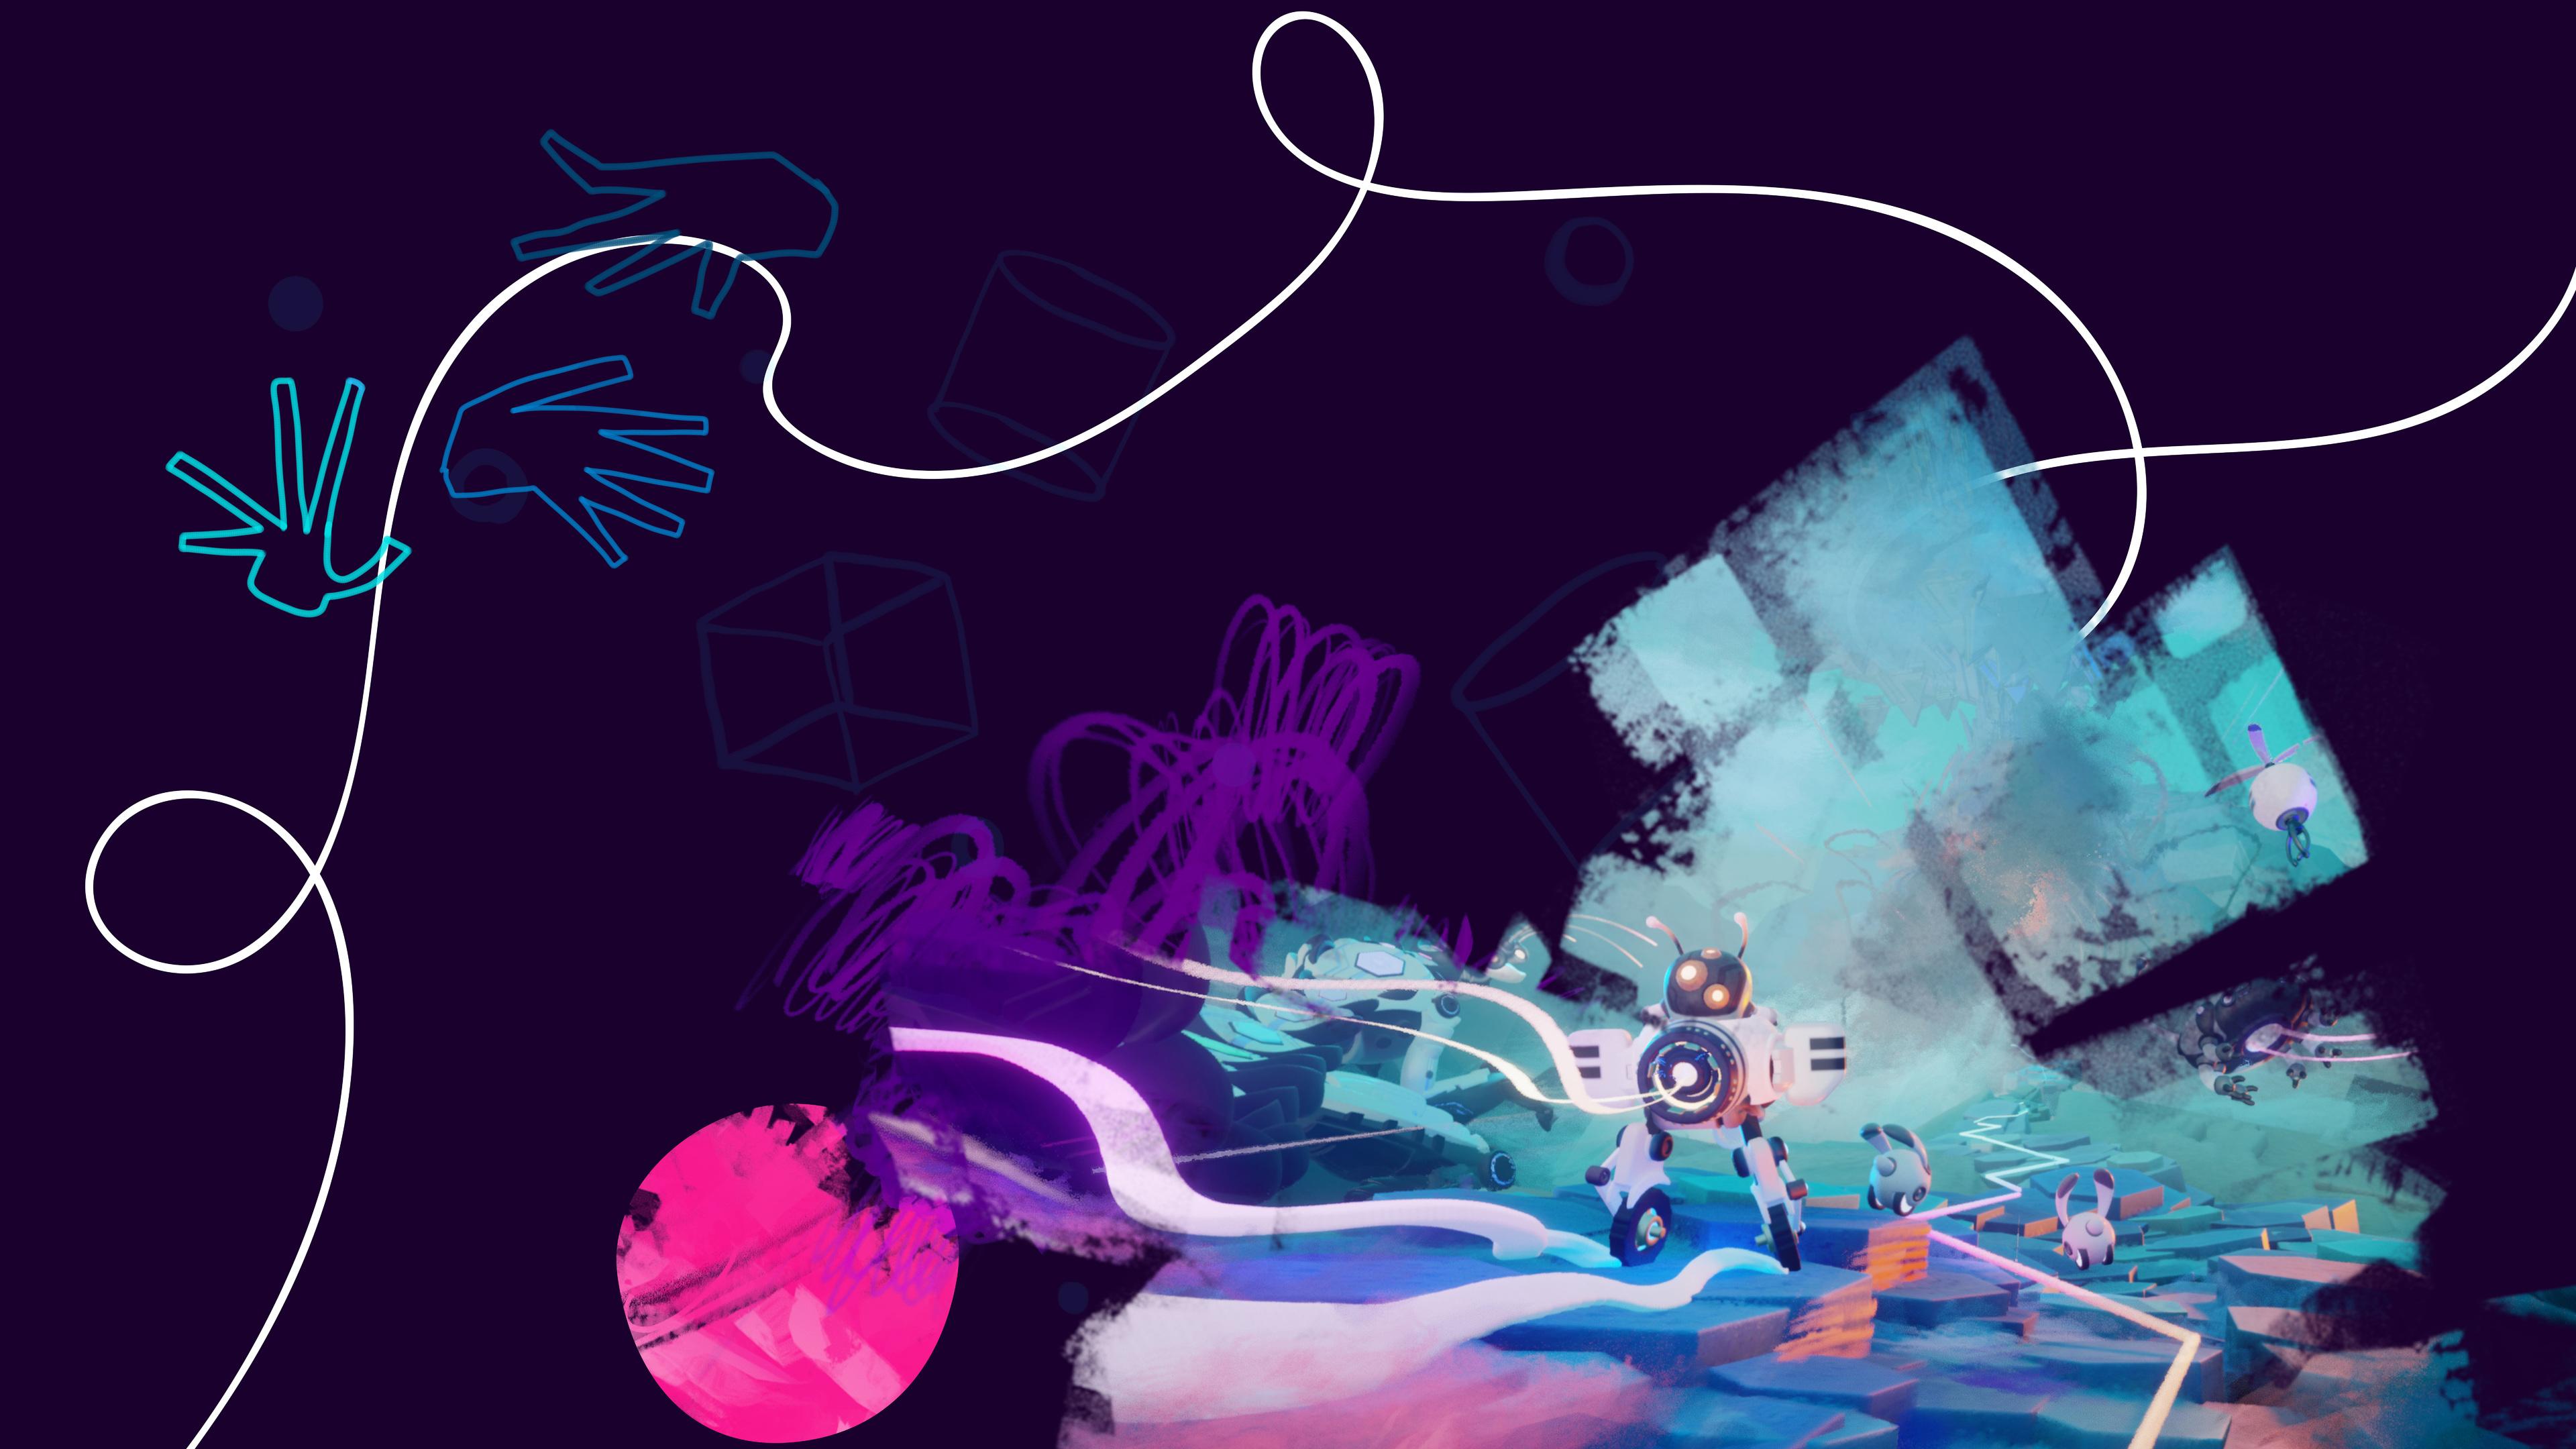 dreams video game ps4 15k 1537691143 - Dreams Video Game Ps4 15k - hd-wallpapers, games wallpapers, dreams video game wallpapers, 8k wallpapers, 5k wallpapers, 4k-wallpapers, 2018 games wallpapers, 15k wallpapers, 12k wallpapers, 10k wallpapers